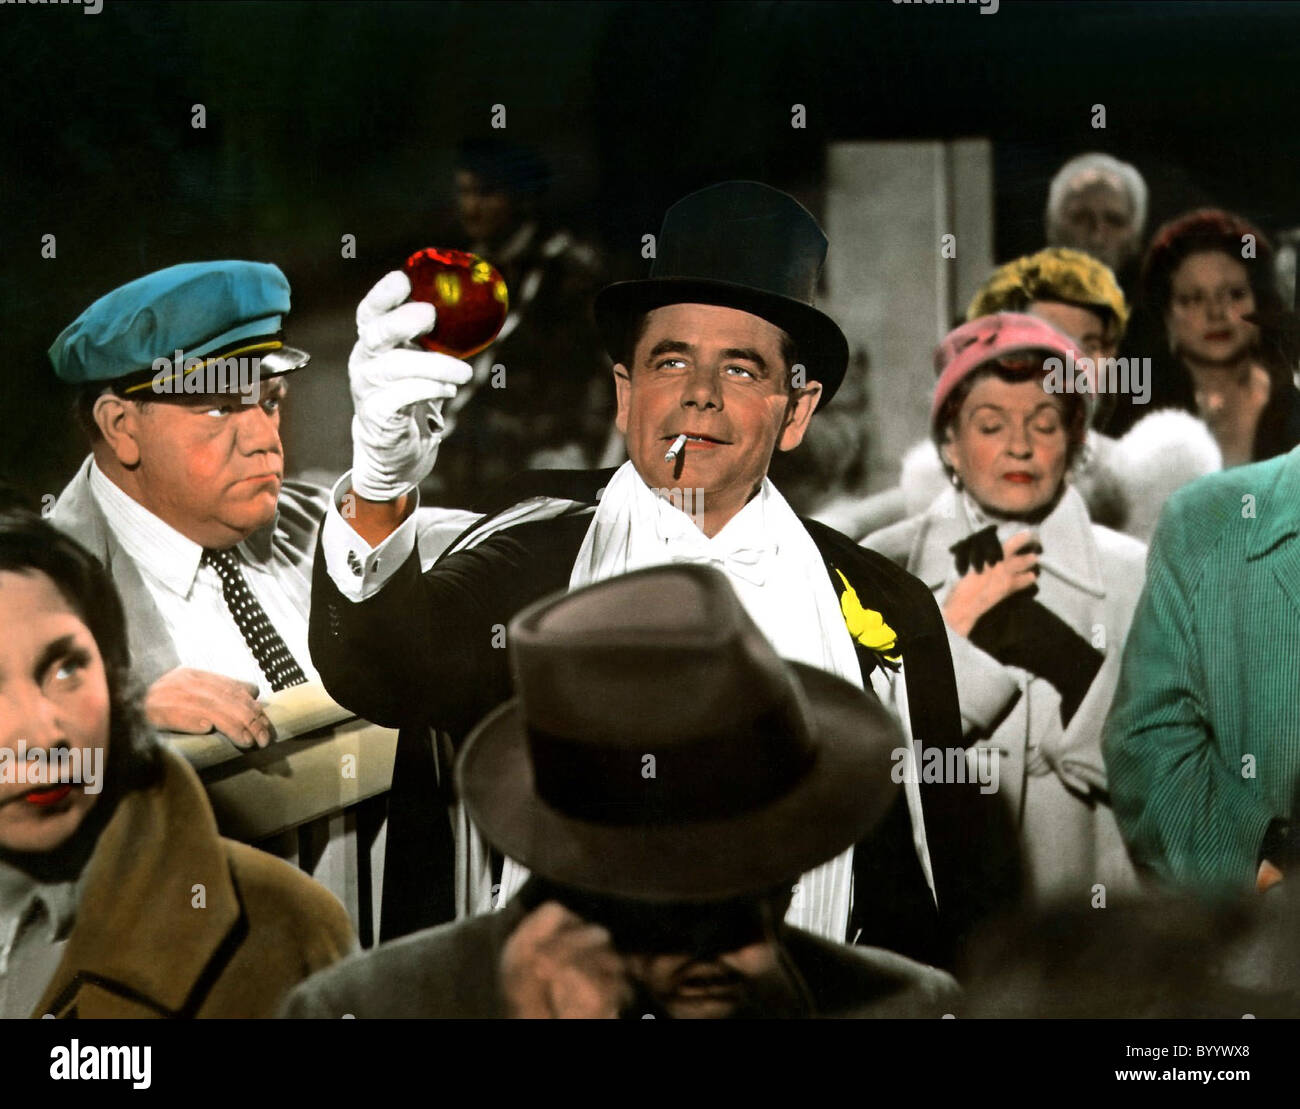 GLENN FORD POCKETFUL OF MIRACLES (1961 Stock Photo ...